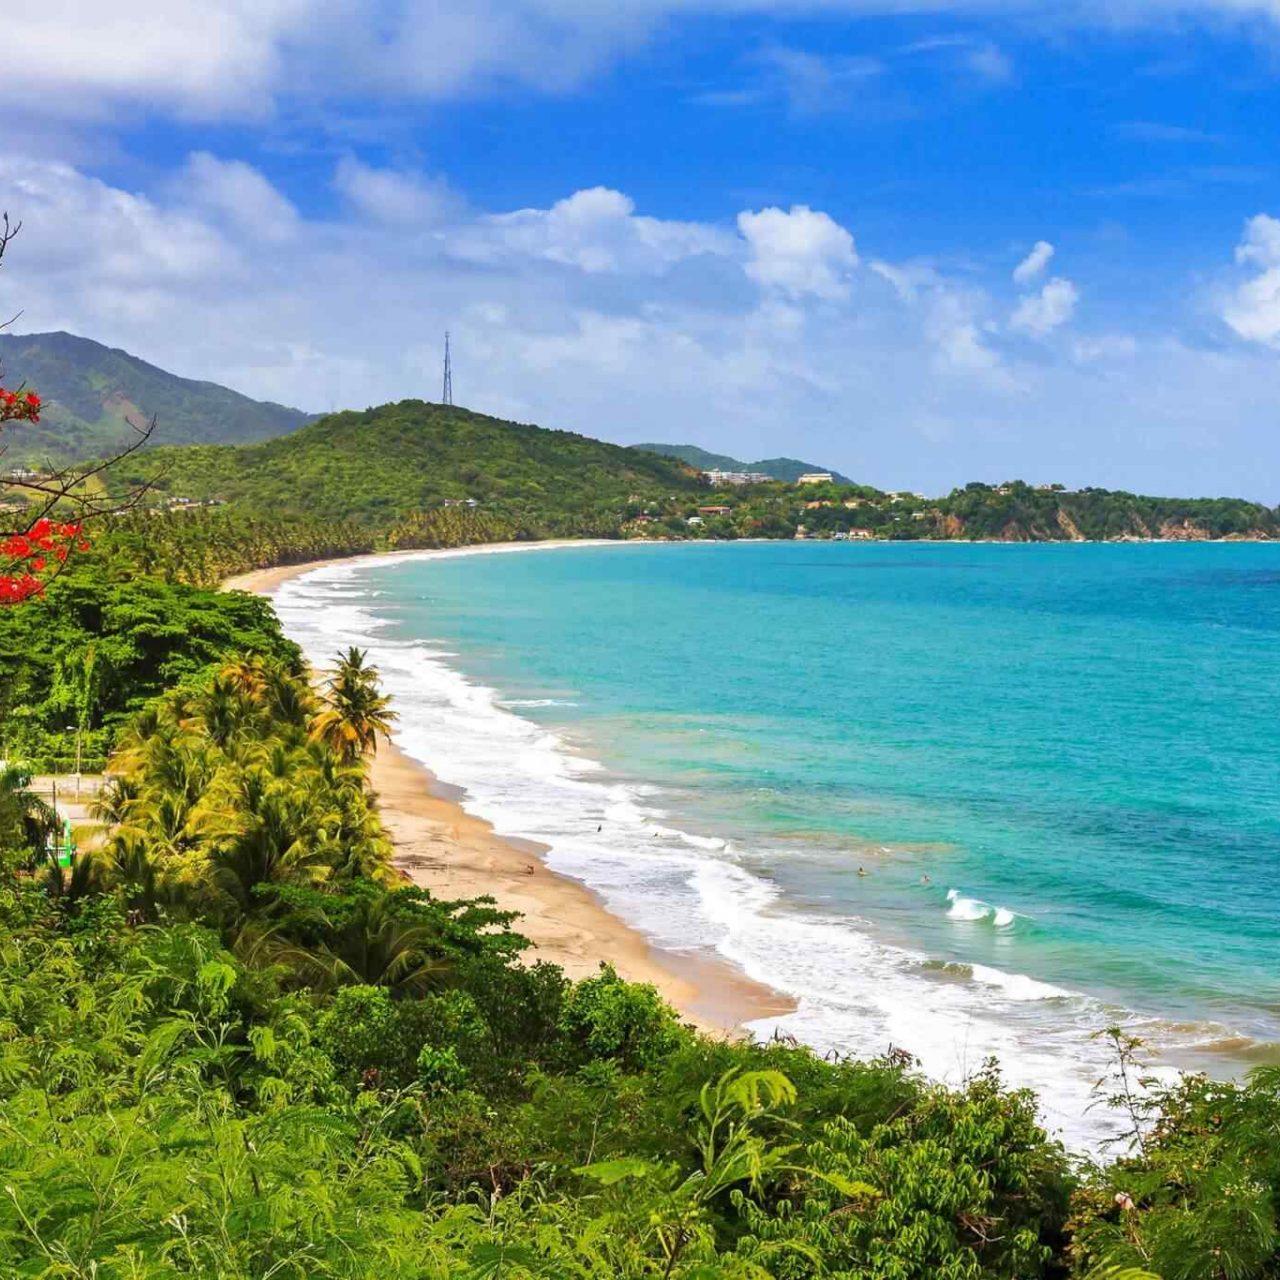 https://www.trekcentralnepal.com/wp-content/uploads/2018/09/destination-puerto-rico-01-1280x1280.jpg